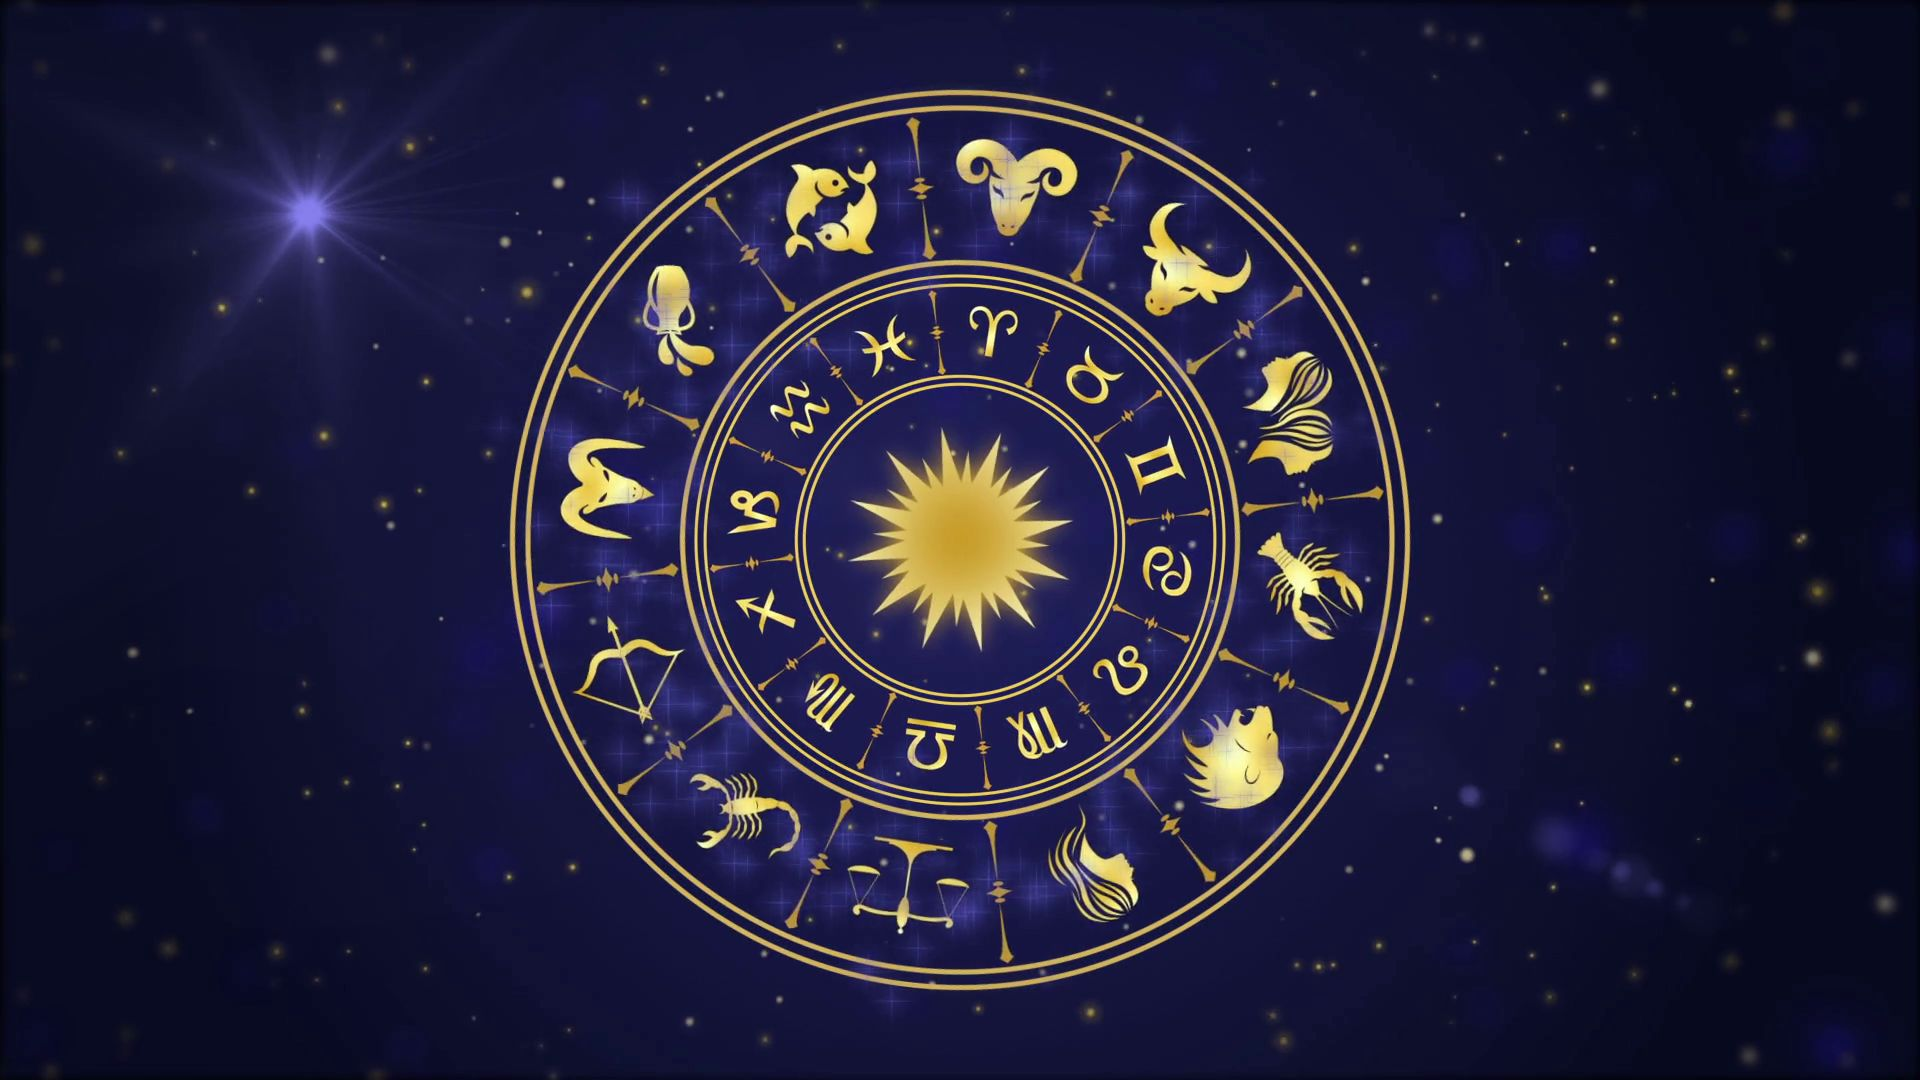 Horoskop 6-12 September: Taurus dan Scorpio Banyak Pengeluaran Dalam Beberapa Hari ke Depan